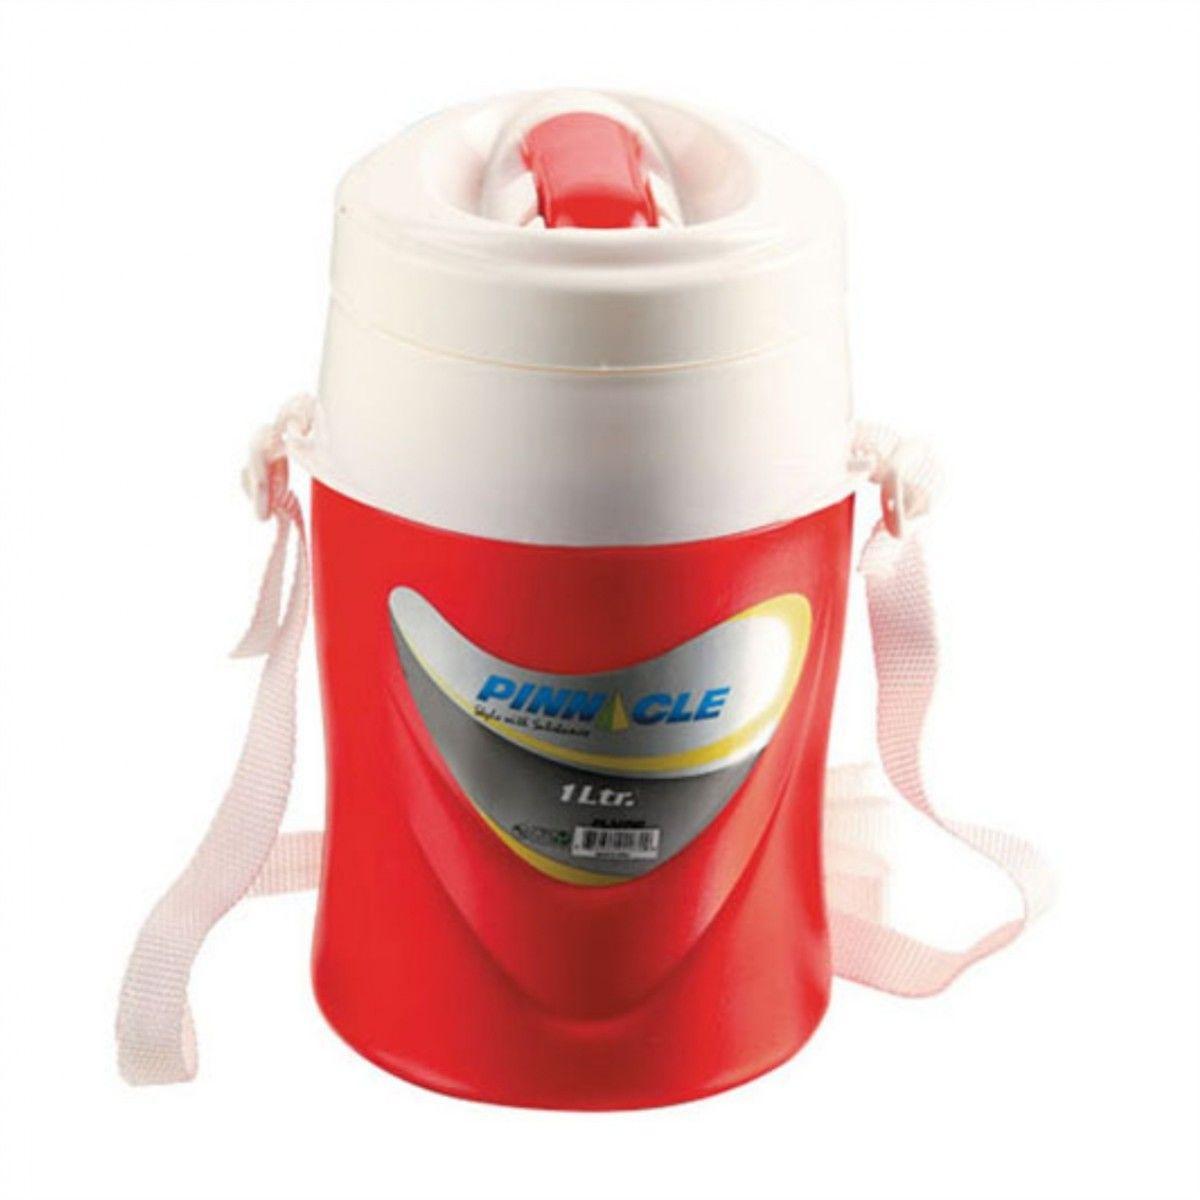 Изотерм. контейнер для жидкости platino 1л красный tpx-2072-1-r pinnacle tr-212768 - фото 1